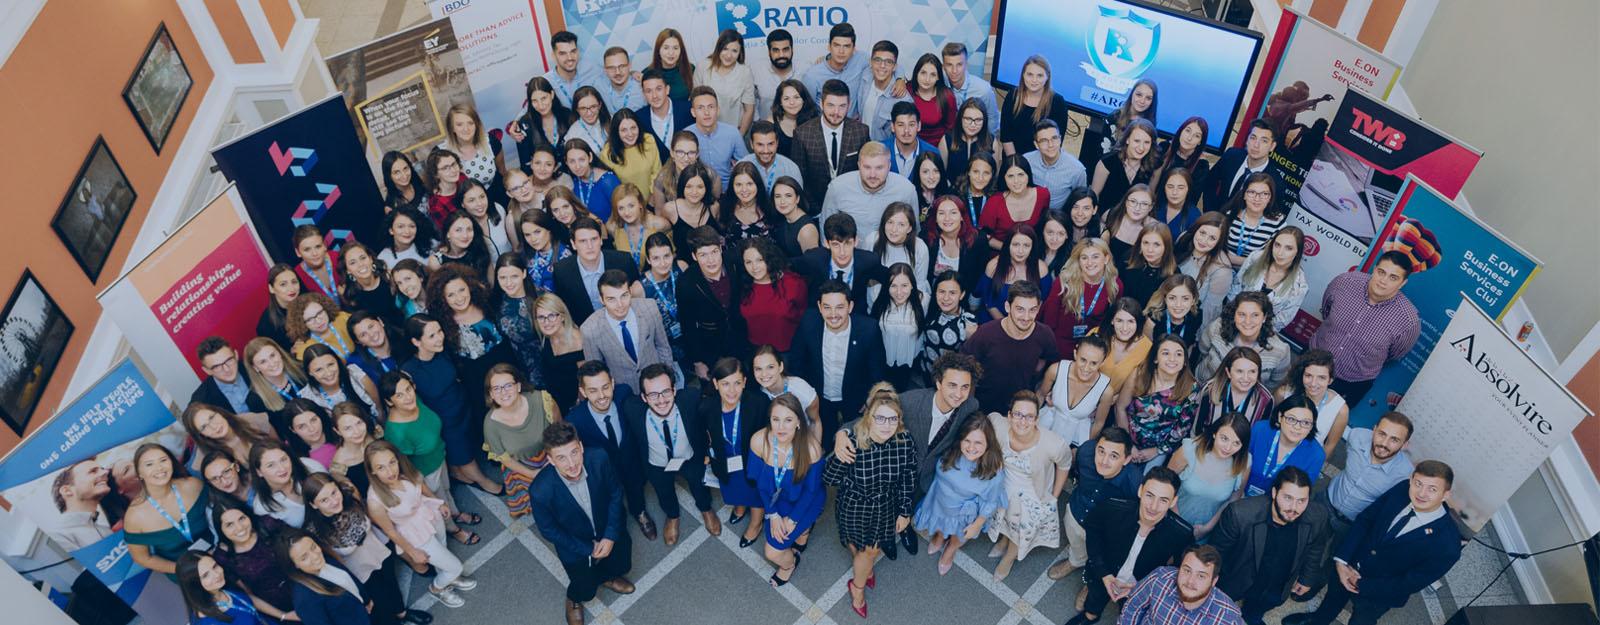 Academia RATIO 2019